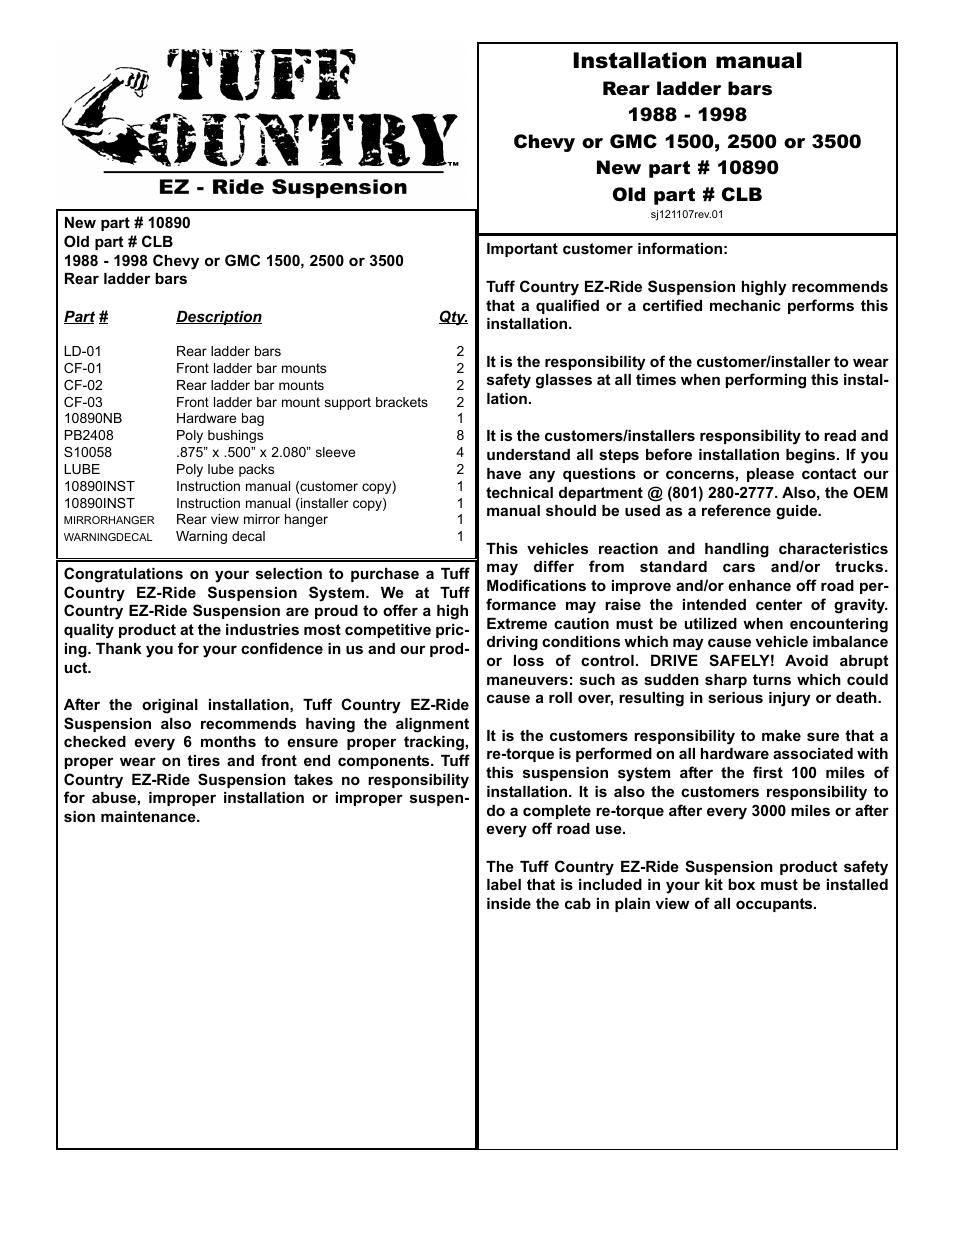 tuff country 10890 gm 88 98 ladder bars user manual 4 pages rh manualsdir com Gutter Installation Guide Garage Door Installation Manual